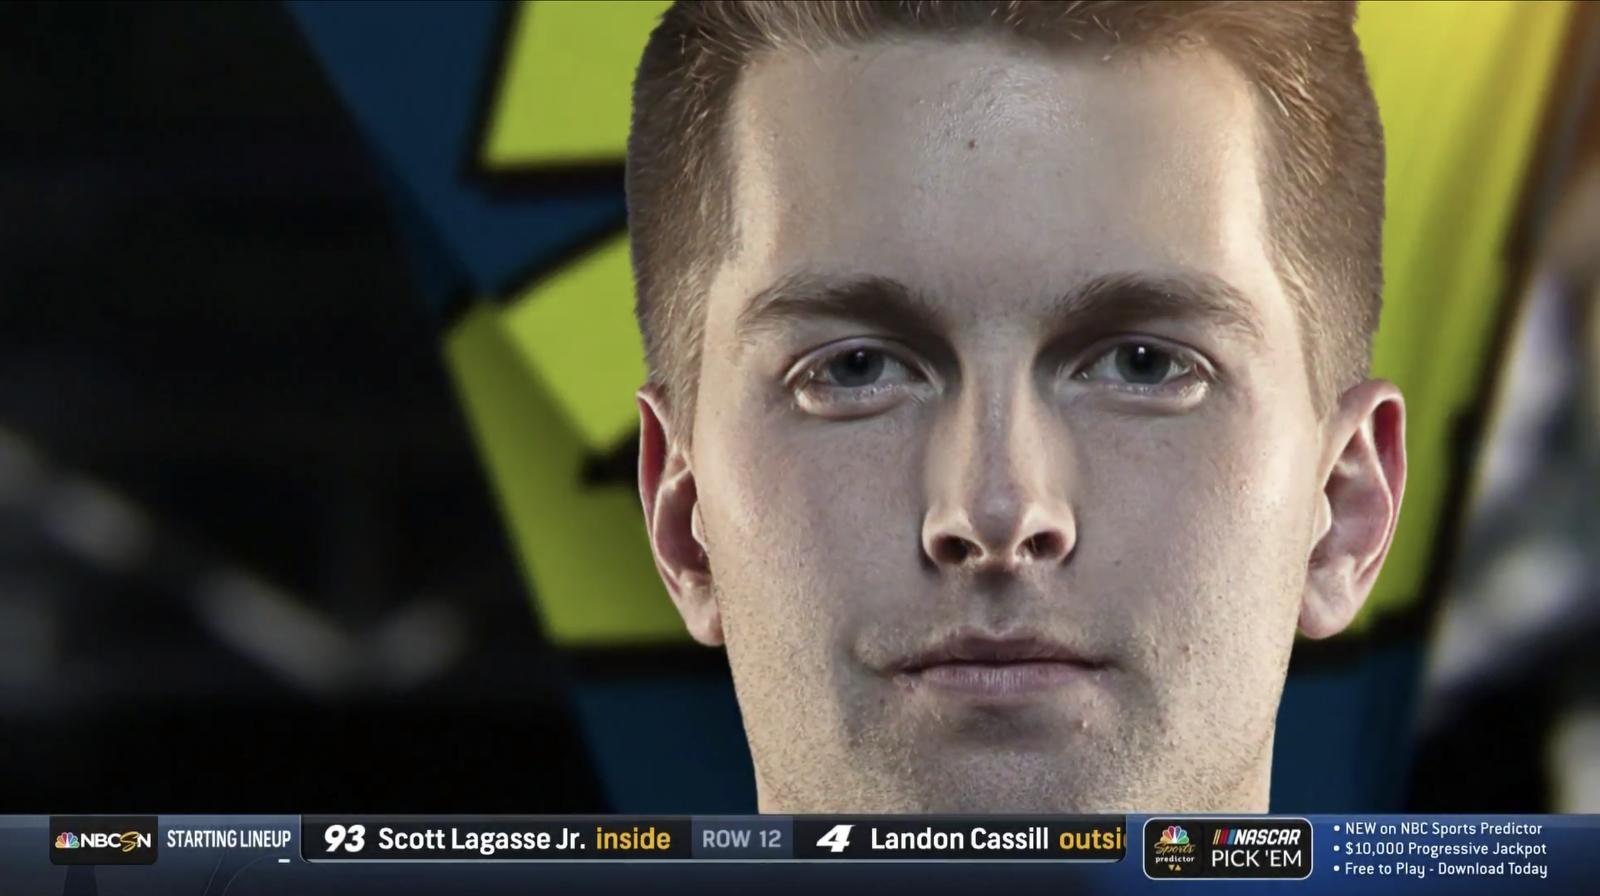 NCS_NBC-Sports_NASCAR-Design_0011